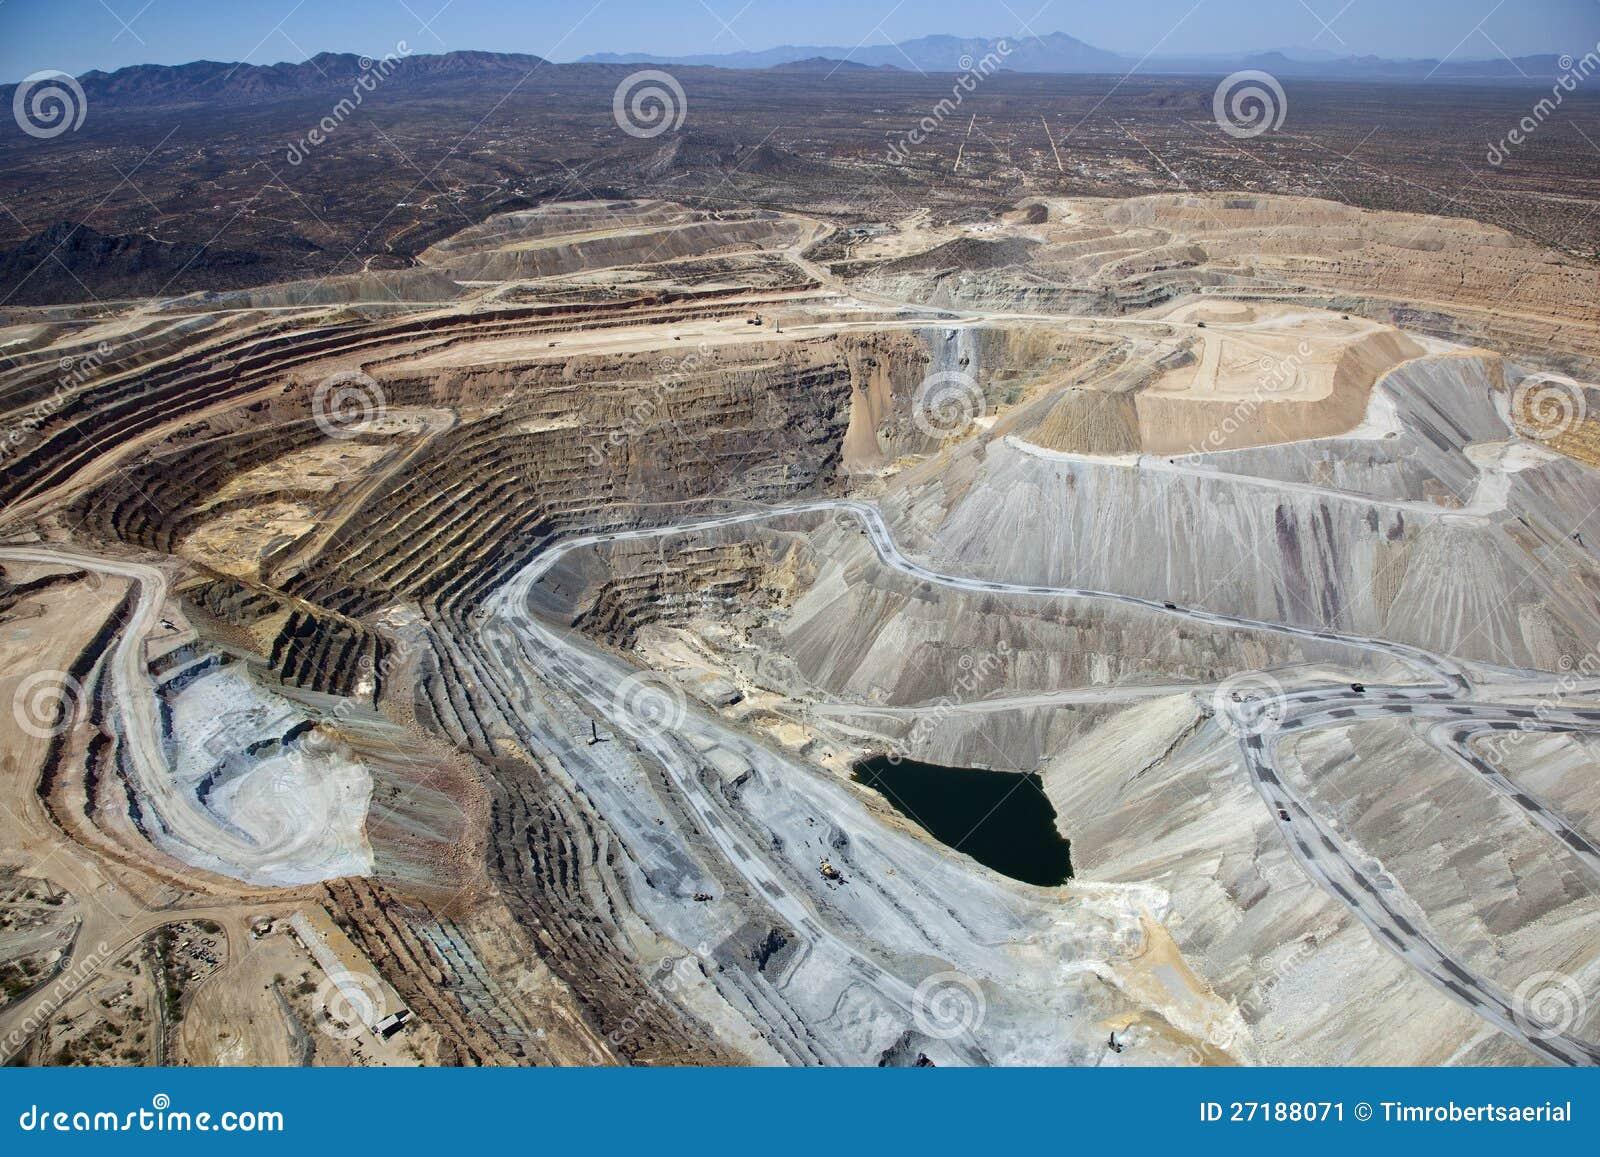 Mina de cobre de poço aberto